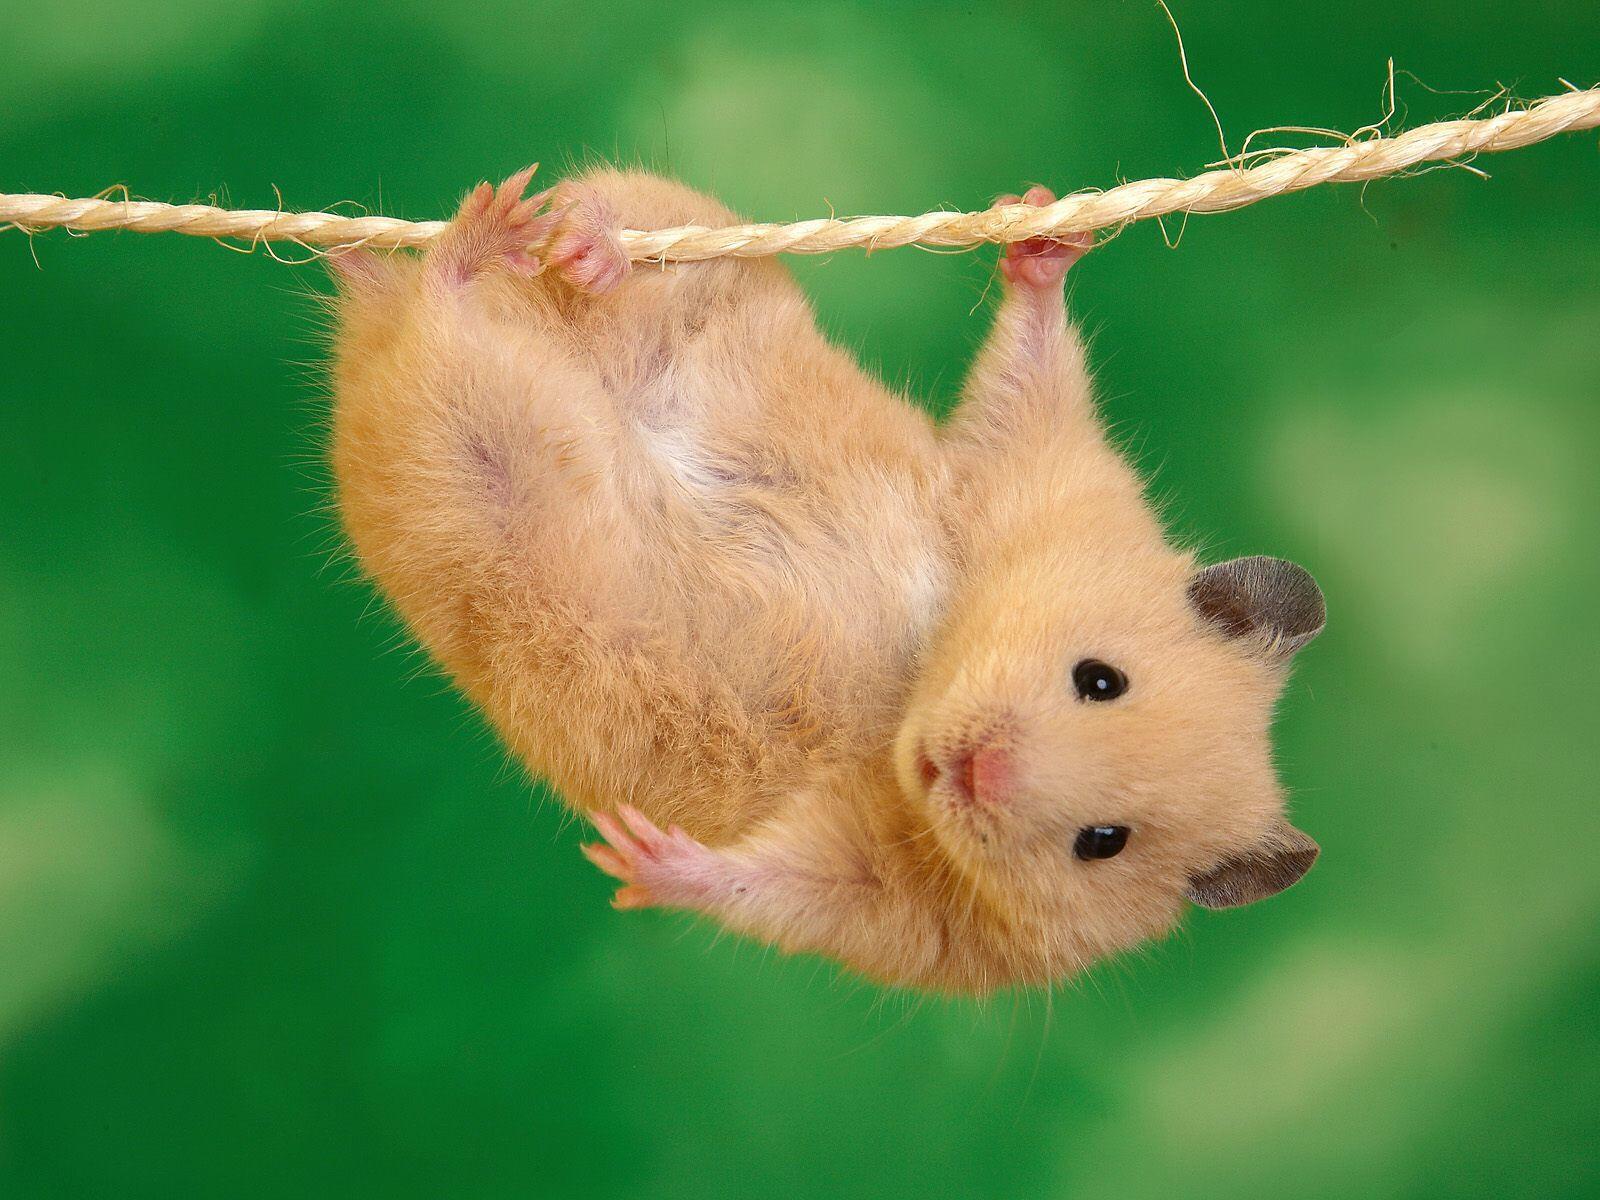 Rope Climb For Gymnastics Funny Animal Photos Cute Animal Photos Funny Hamsters